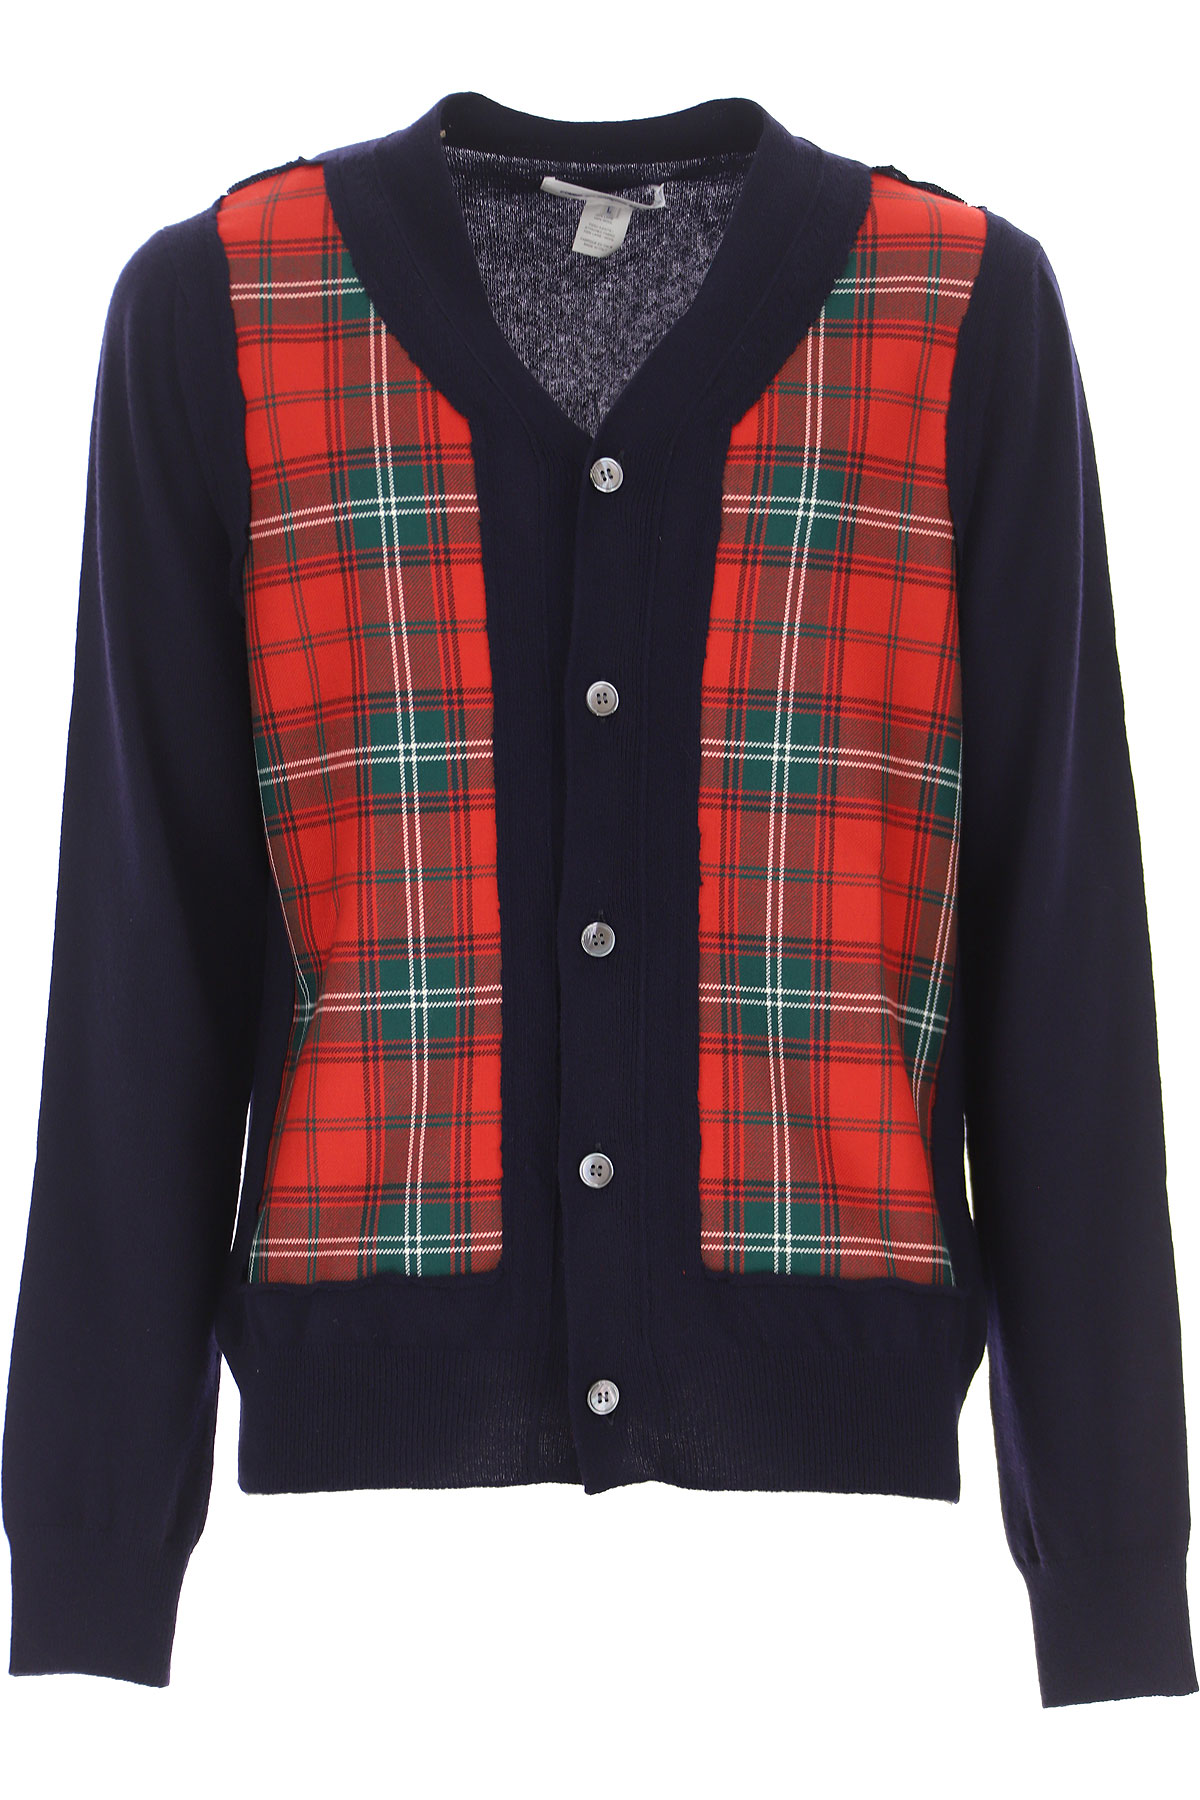 Comme des Garcons T-Shirt for Men On Sale, Midnight Blue, Wool, 2019, L M XL